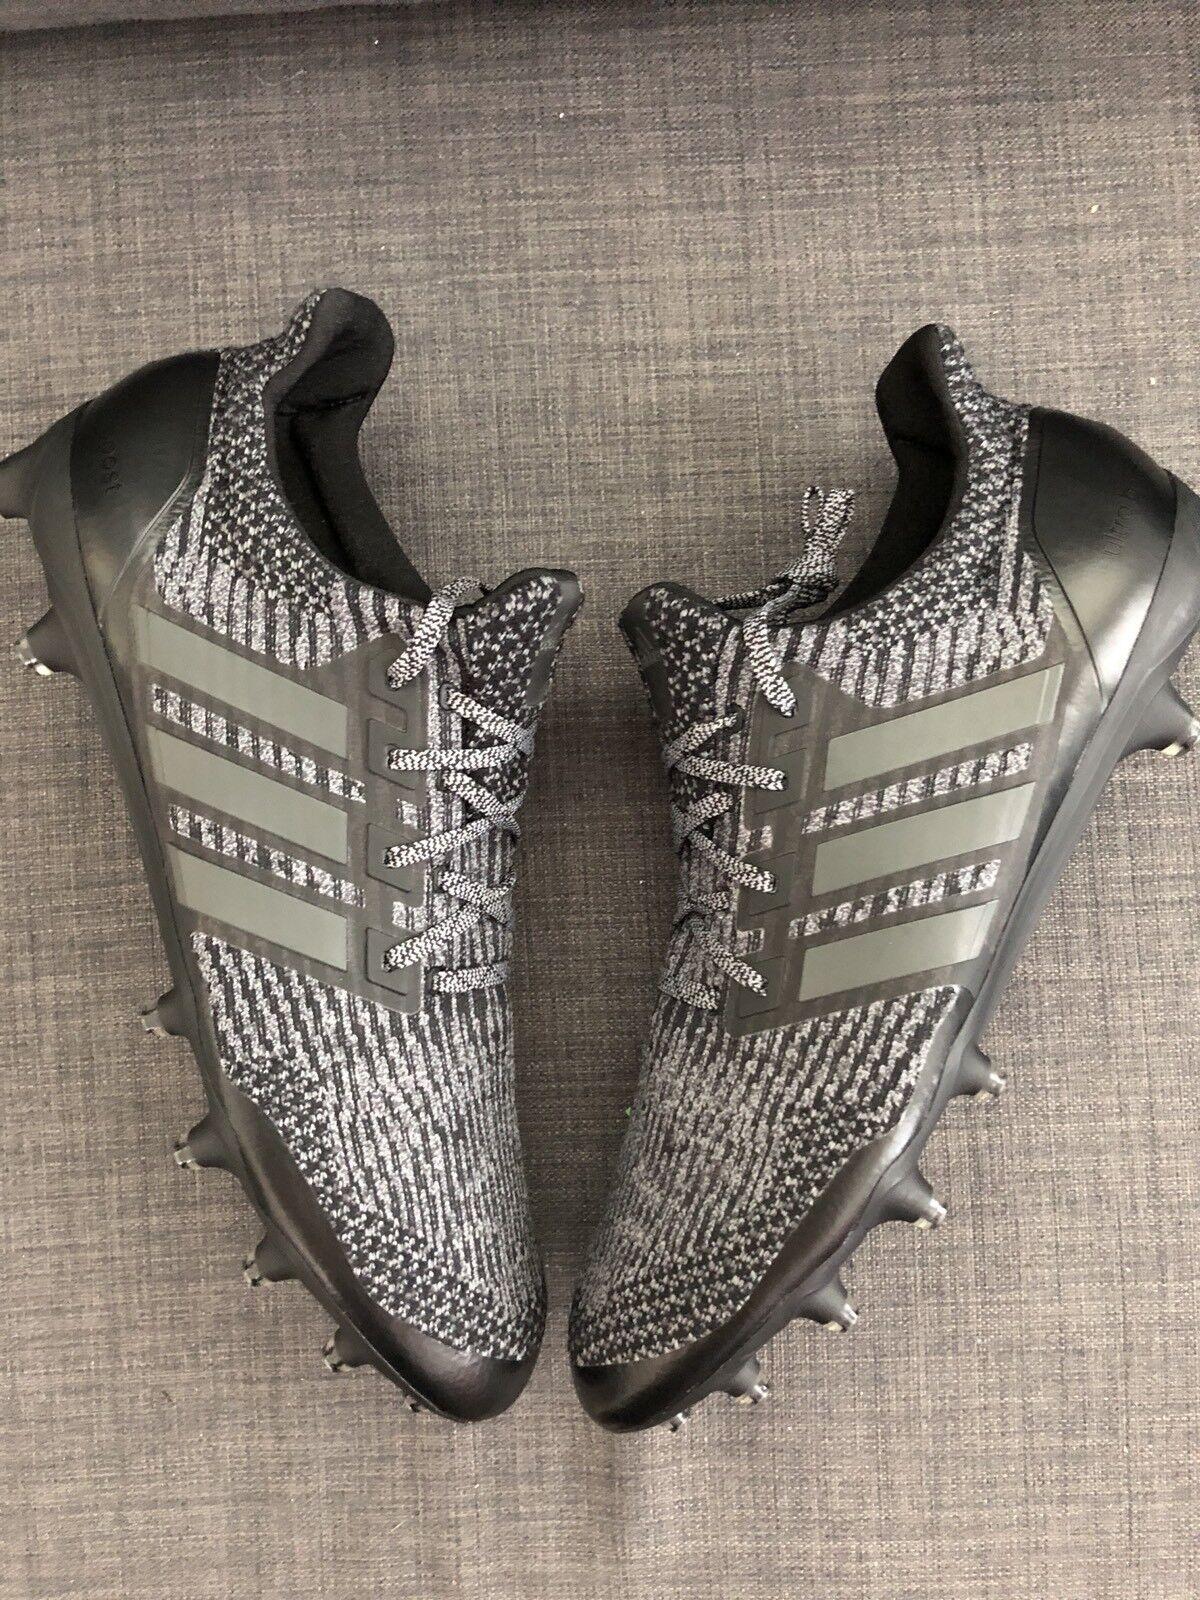 Adidas Ultra Boost Cleats Black untouchable CG4815 Football UltraBoost sz 14 NEW